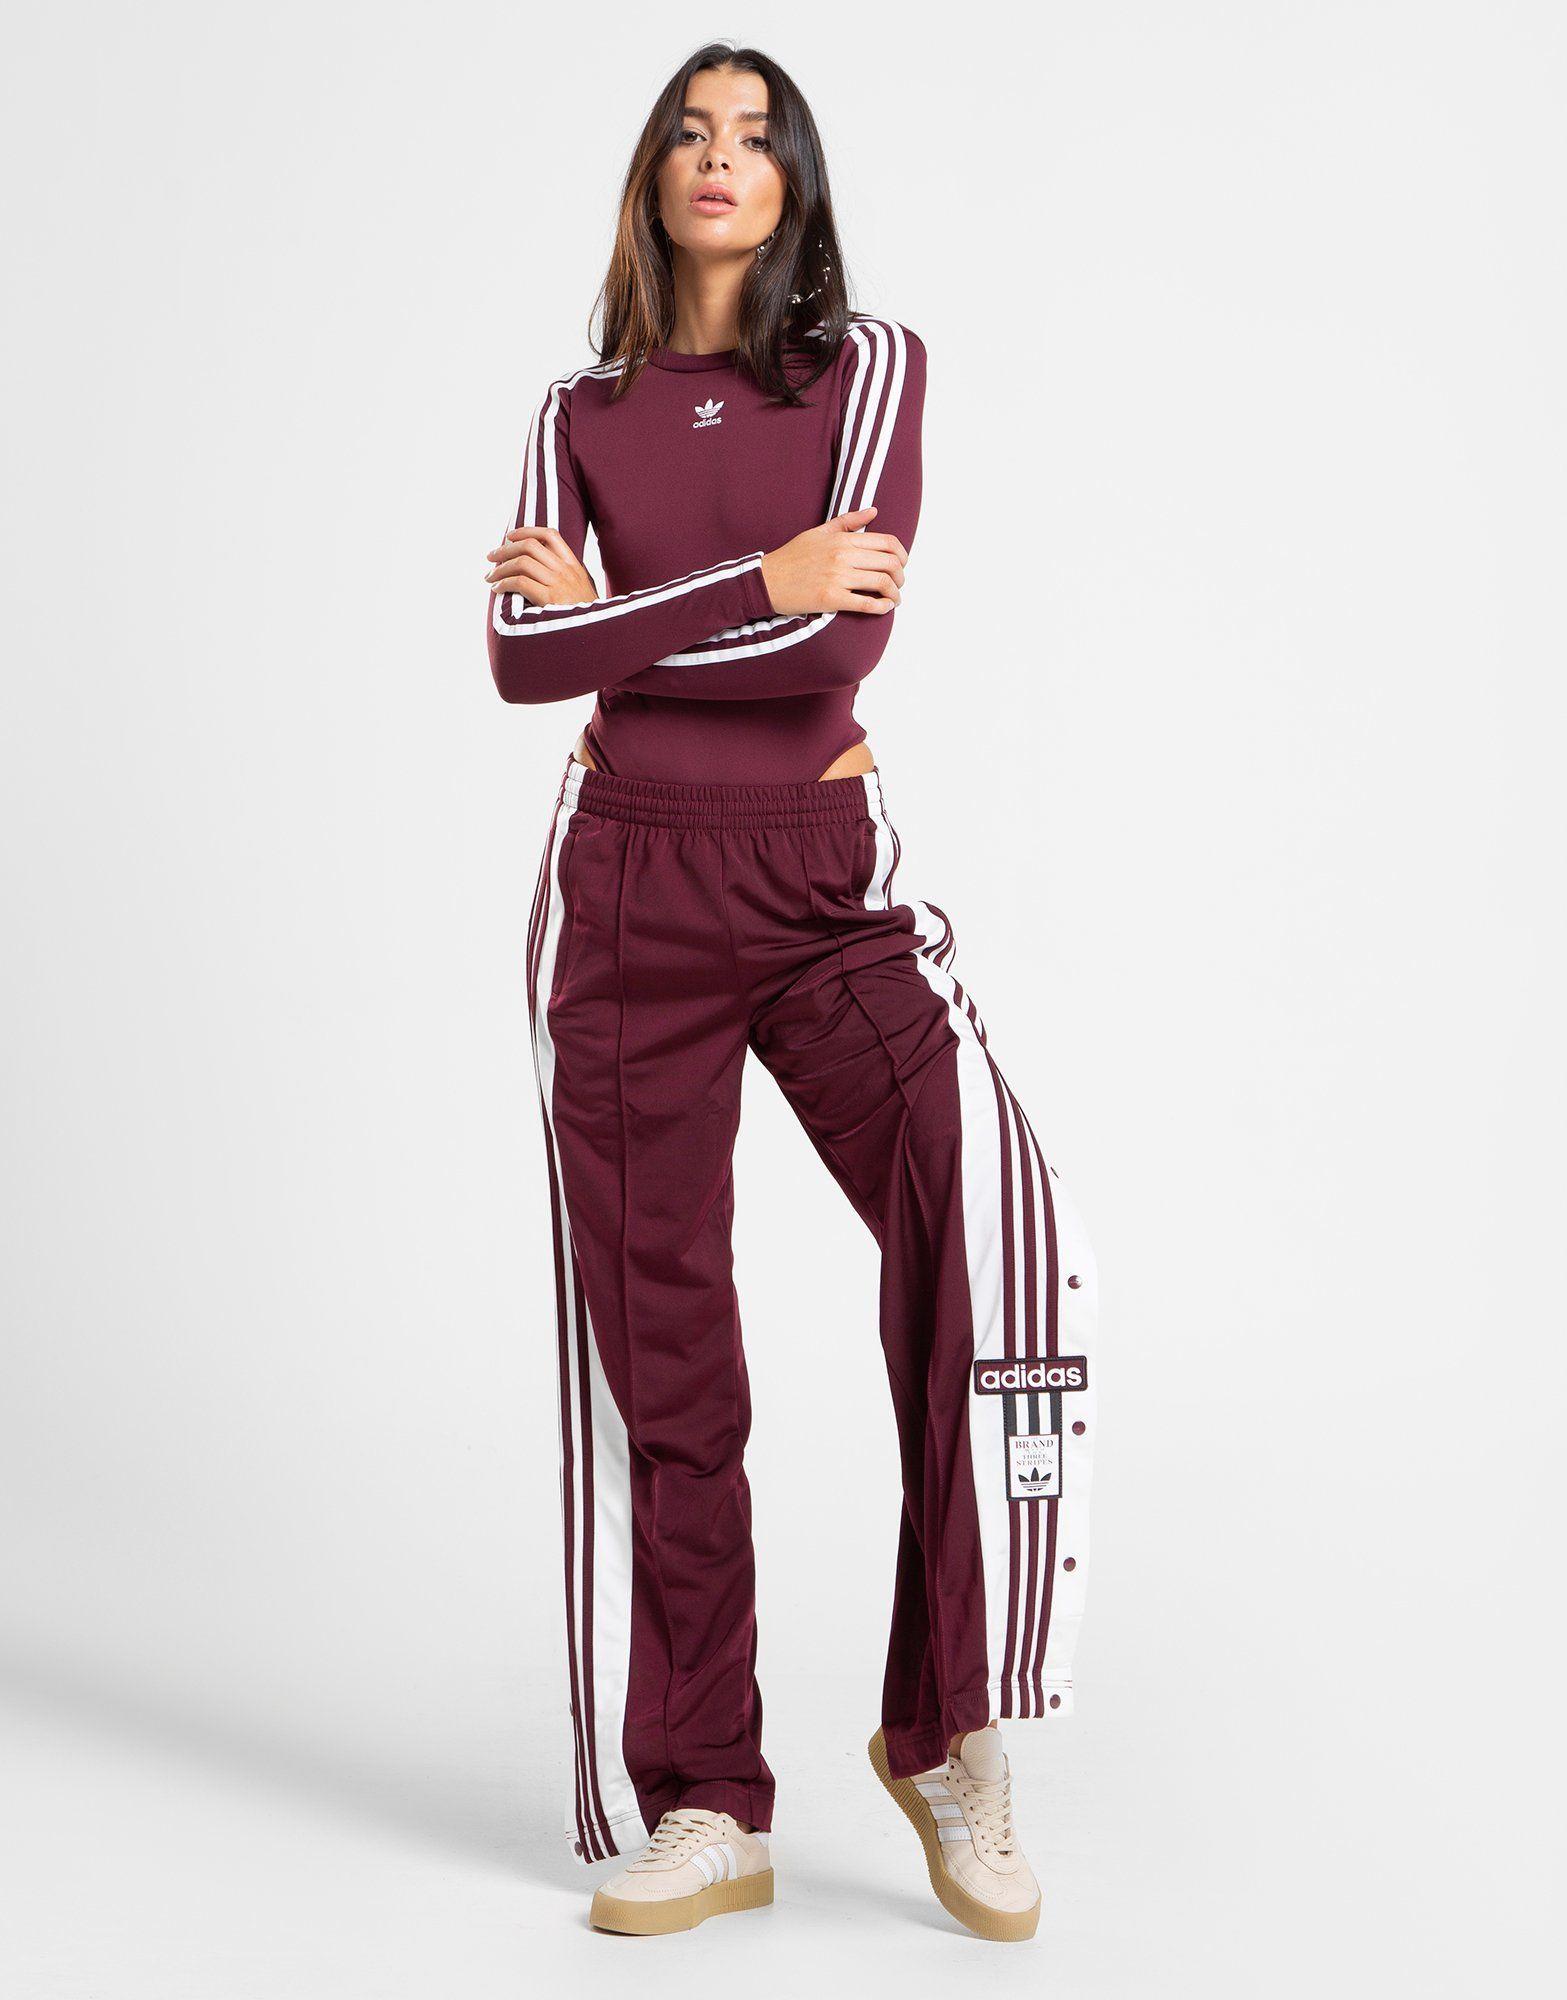 adidas Originals Three Stripe Long Sleeve Top In Burgundy